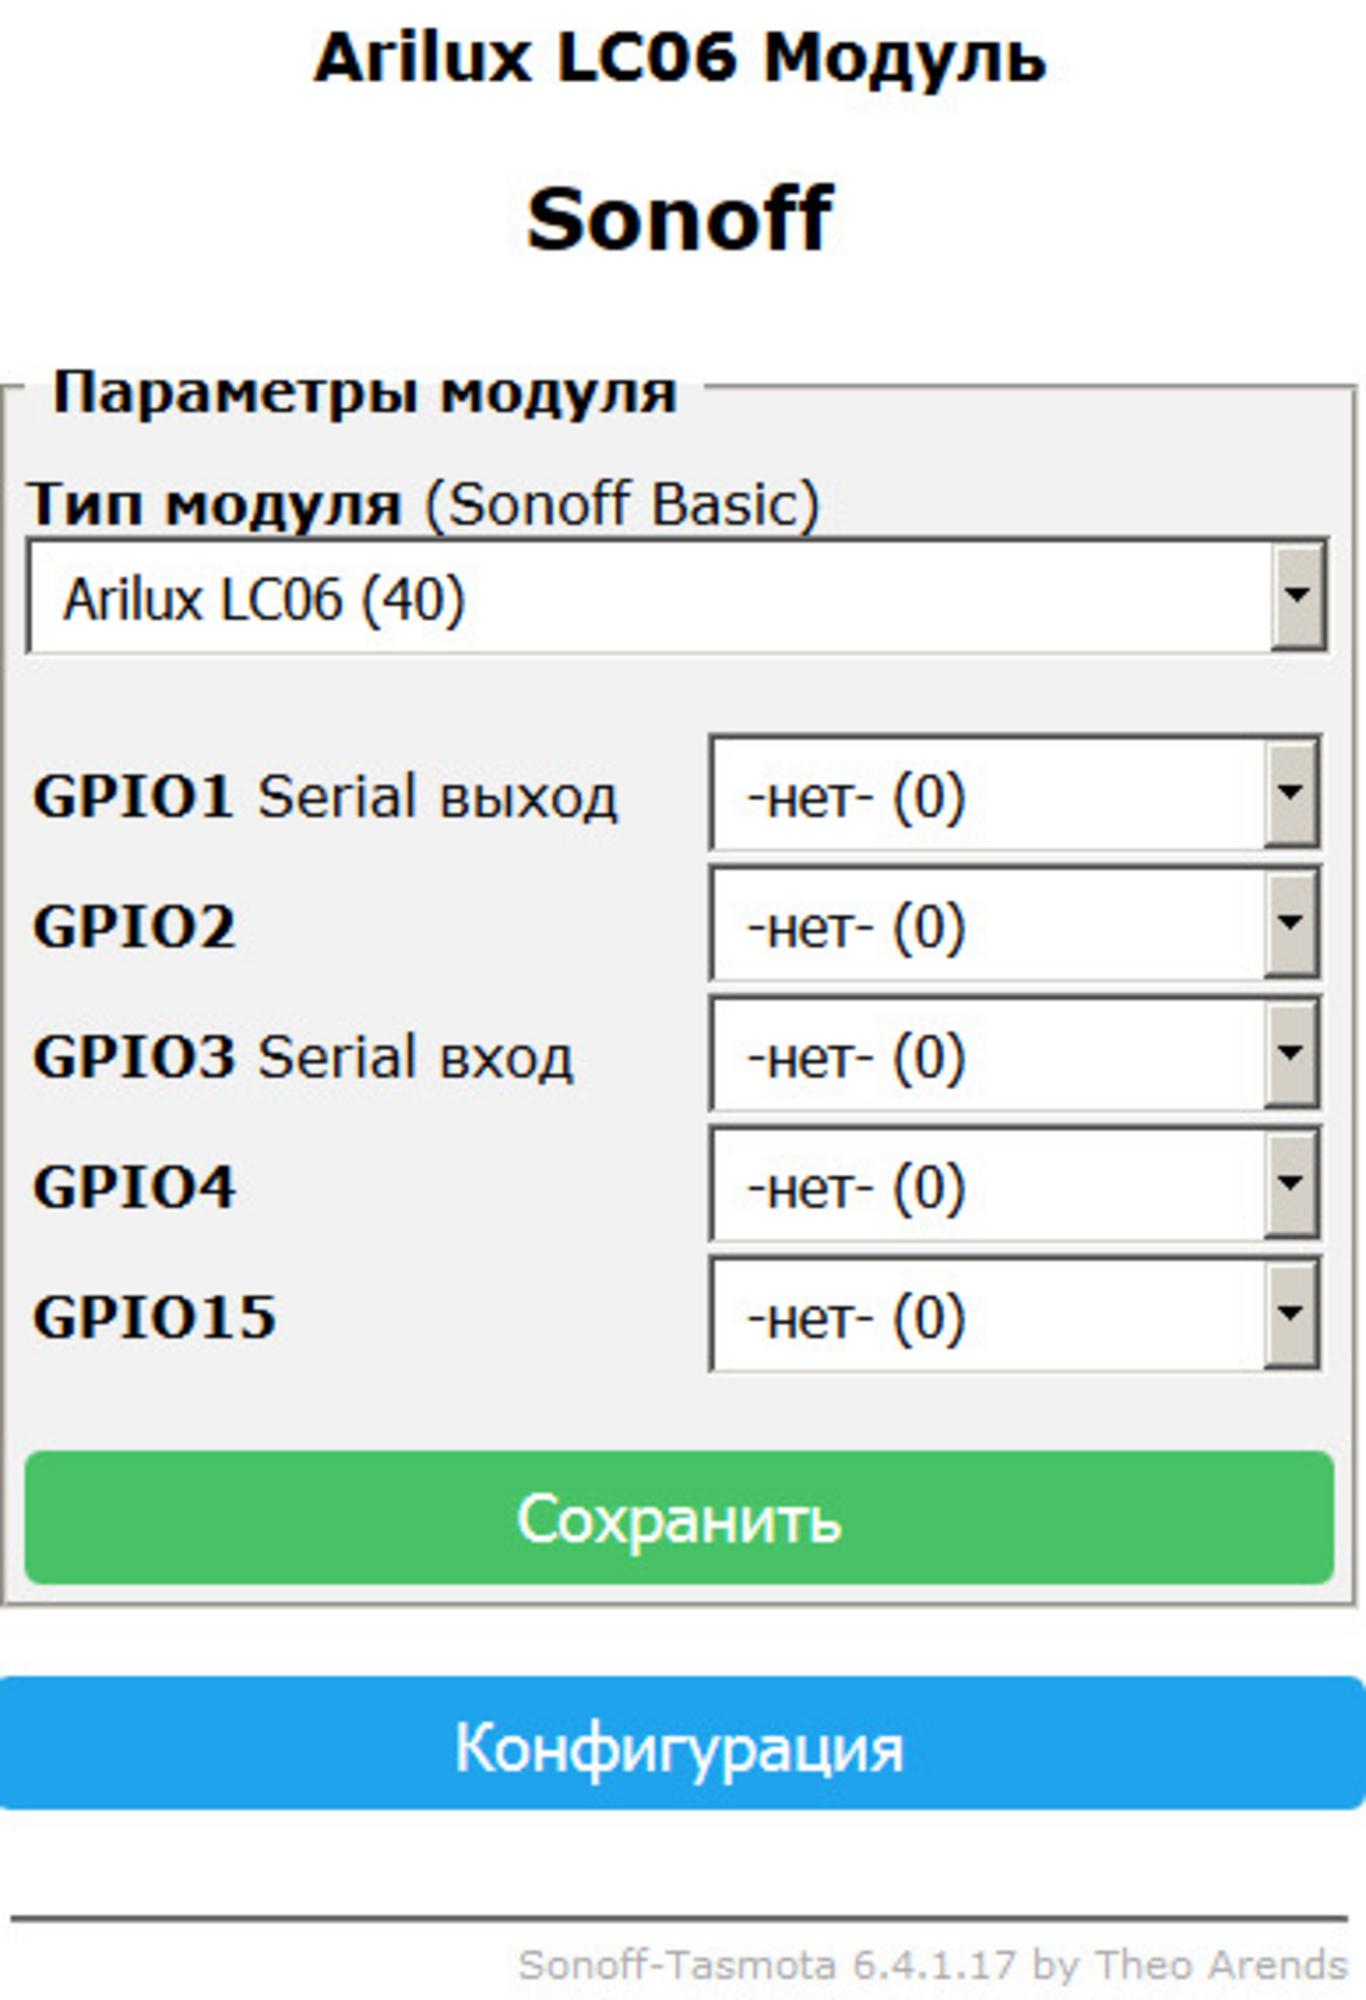 2000x2000x_image.png?1550715036